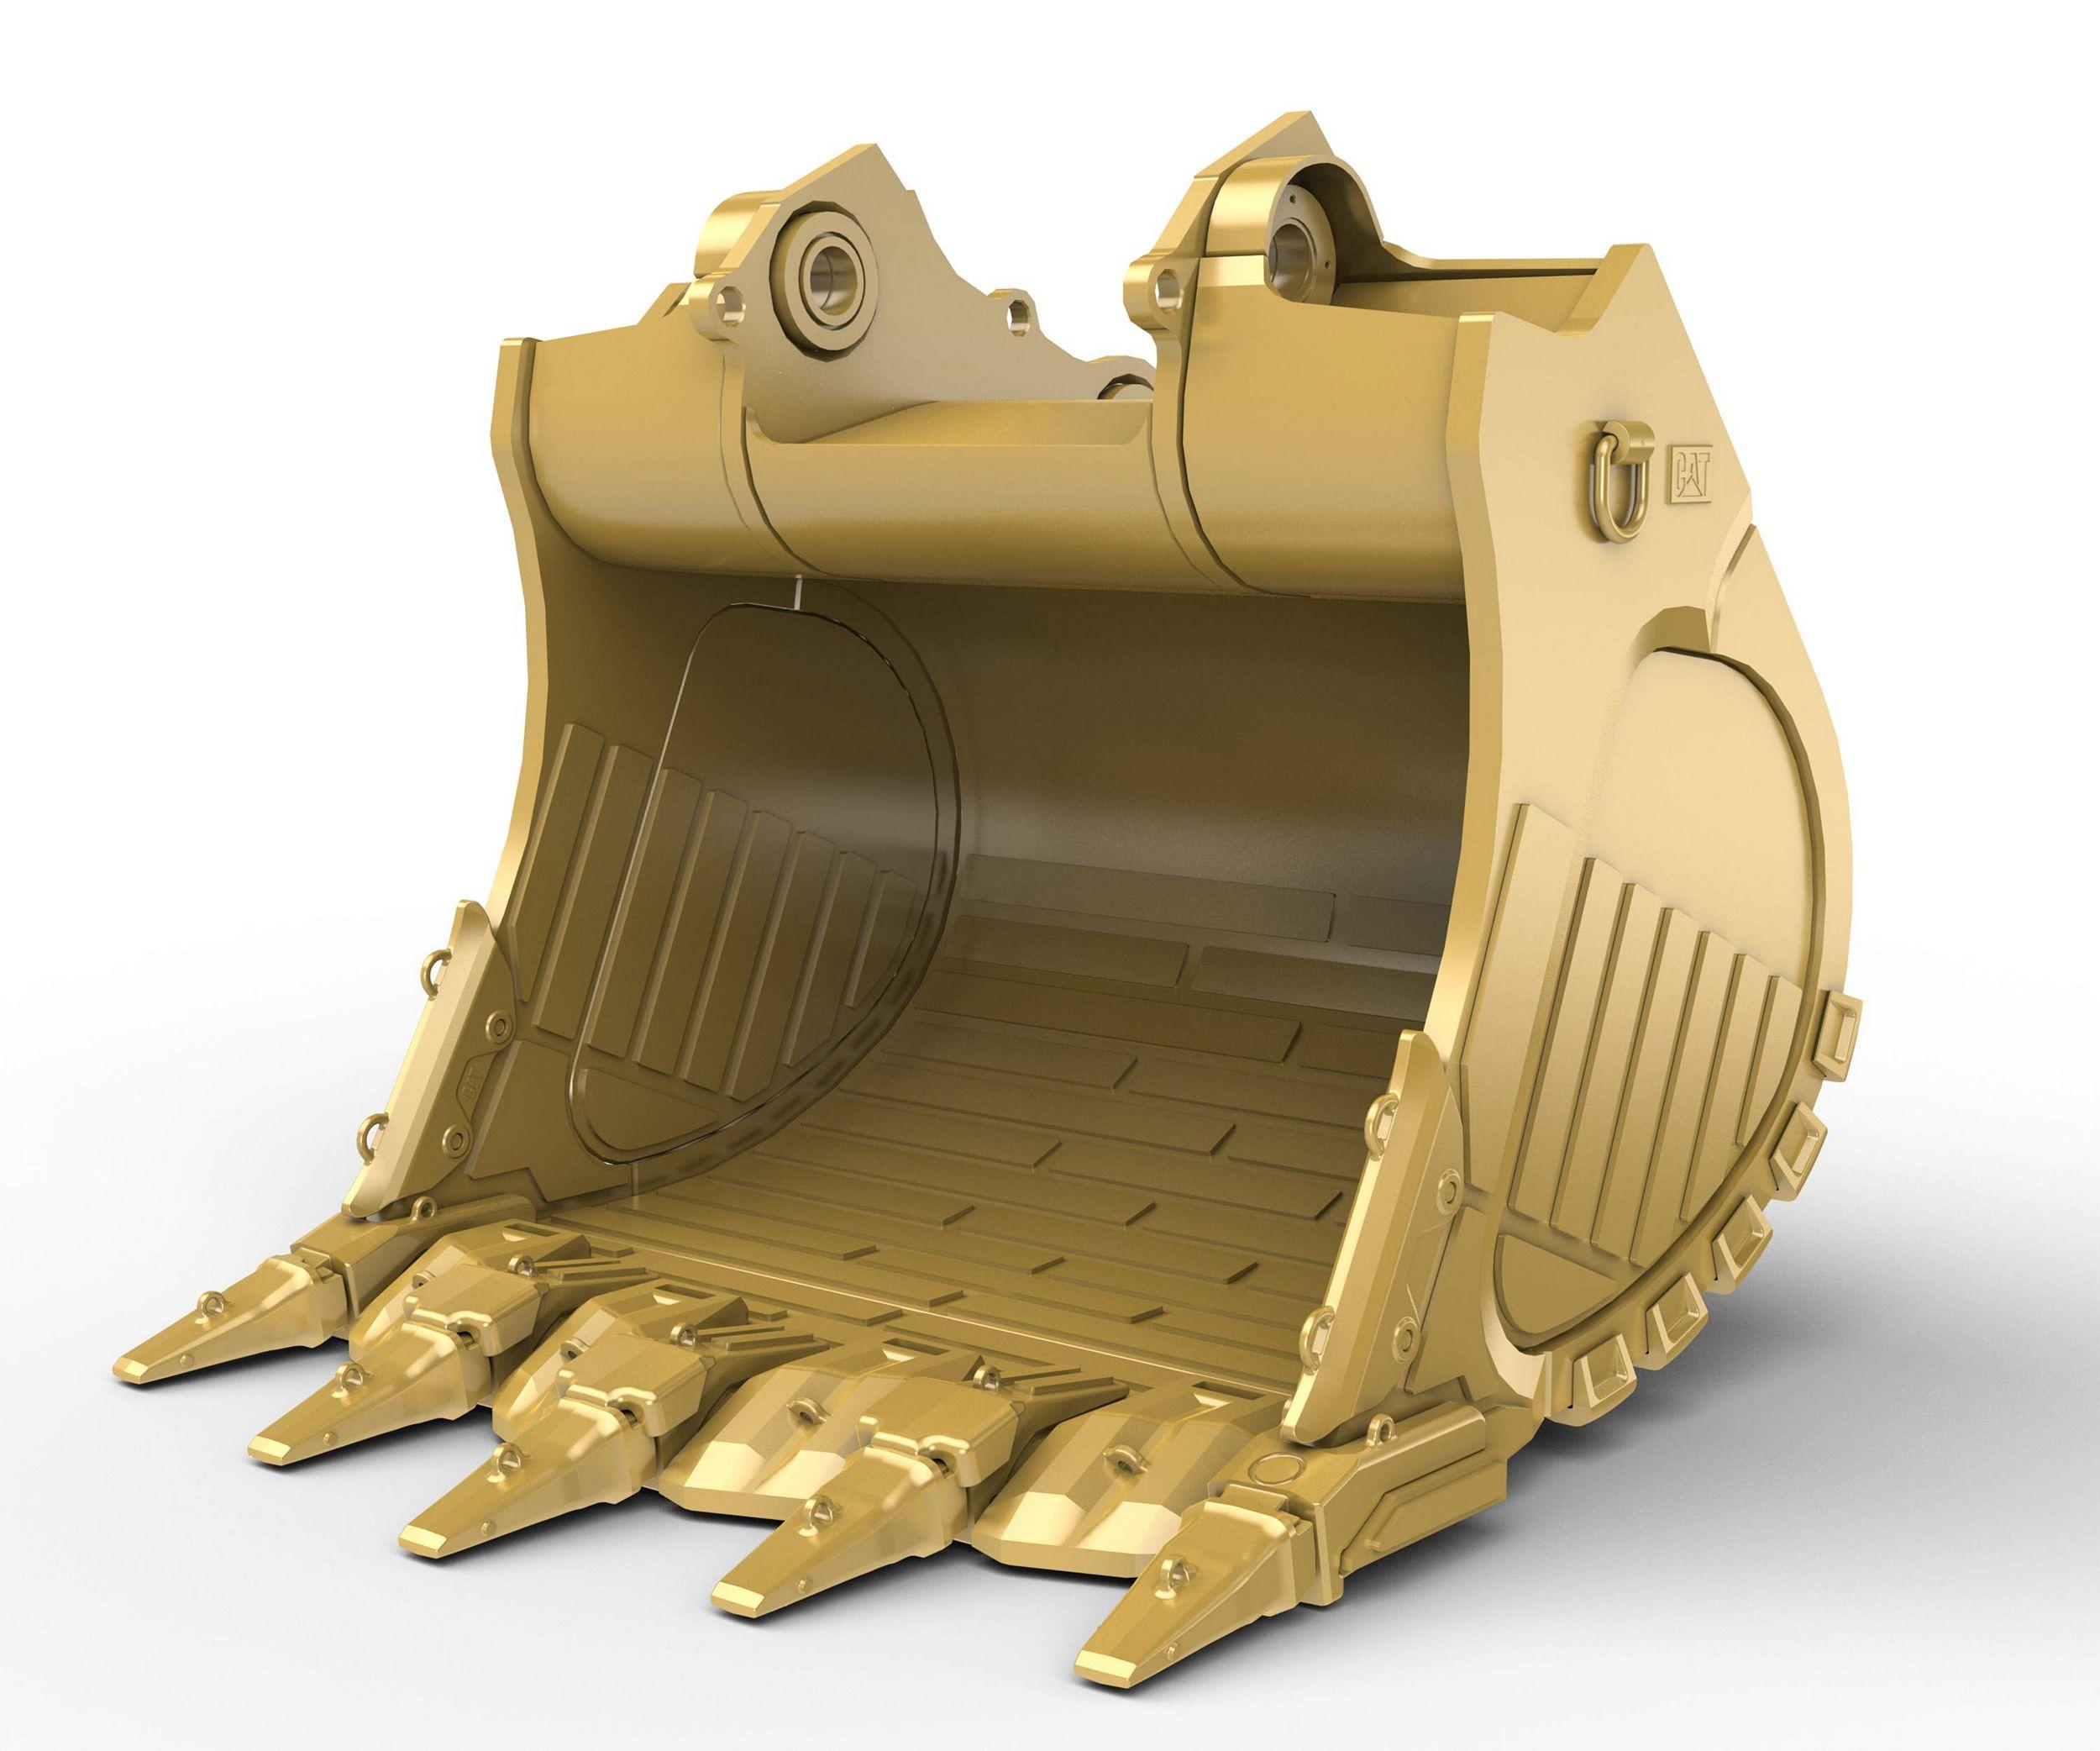 8.5m³ (11.1yd³) Heavy Rock bucket for the 6018 Hyd Mining Shovel